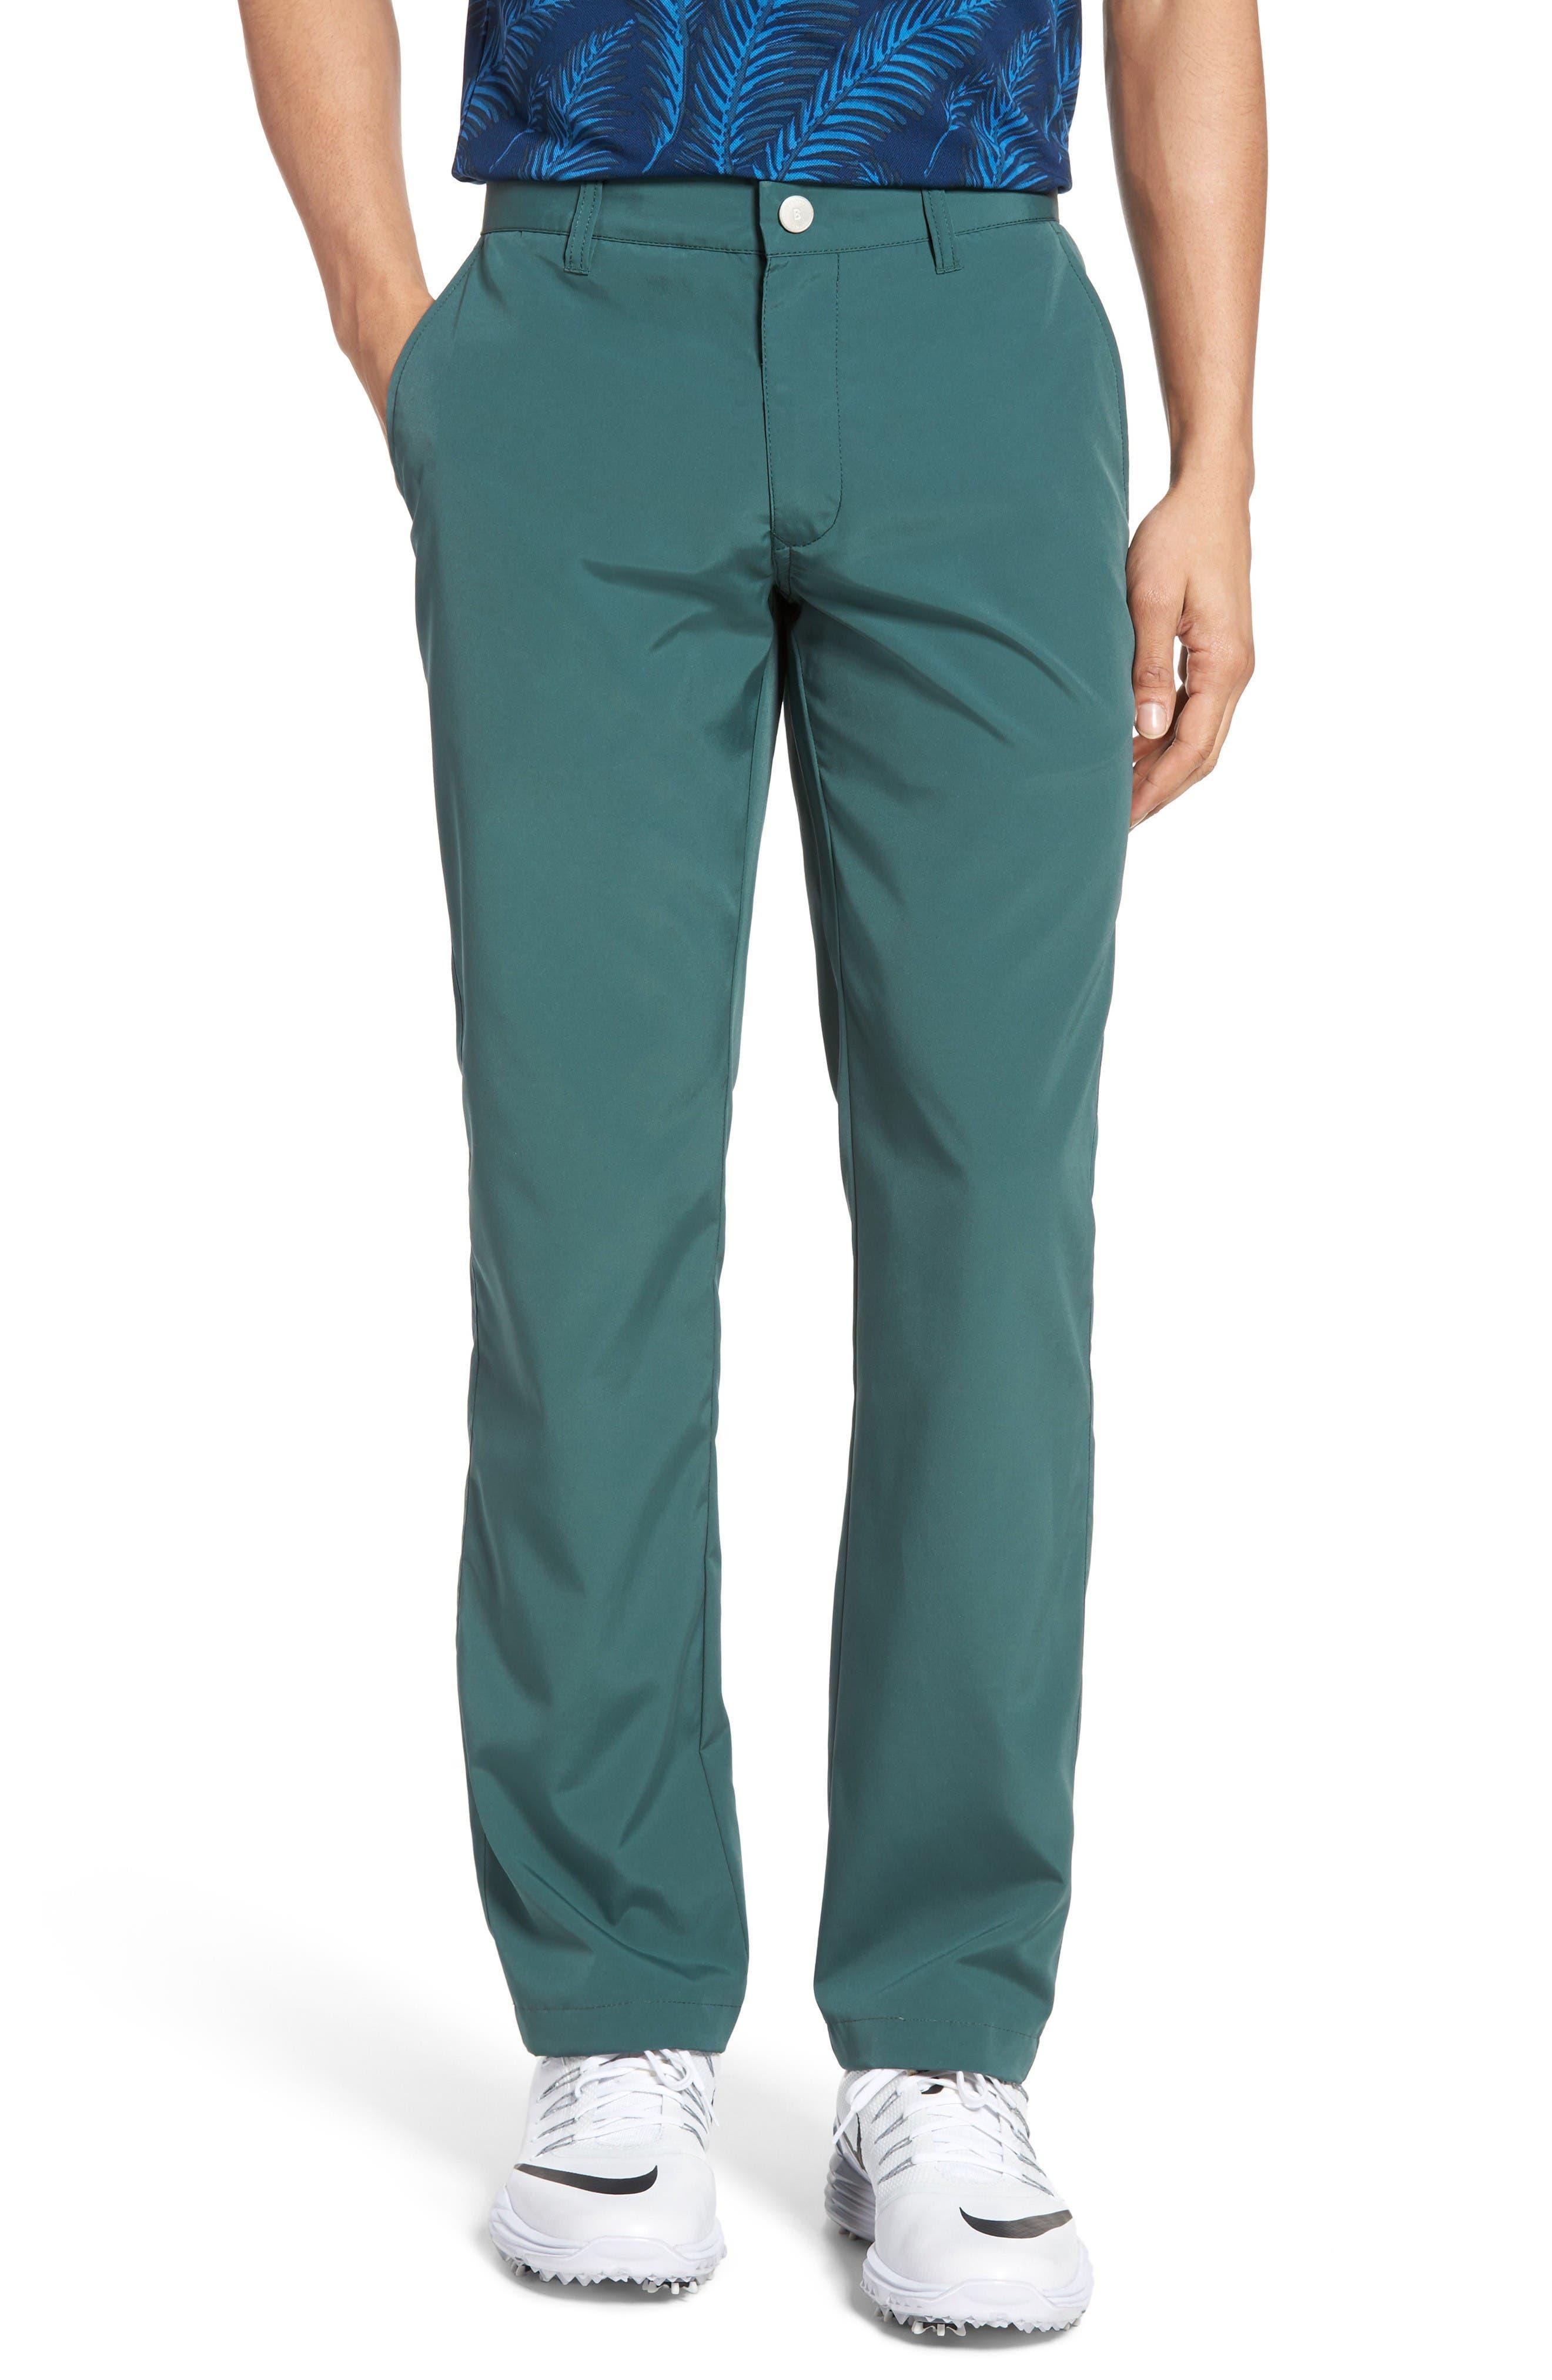 Bonobos Lightweight Highland Slim Fit Golf Pants